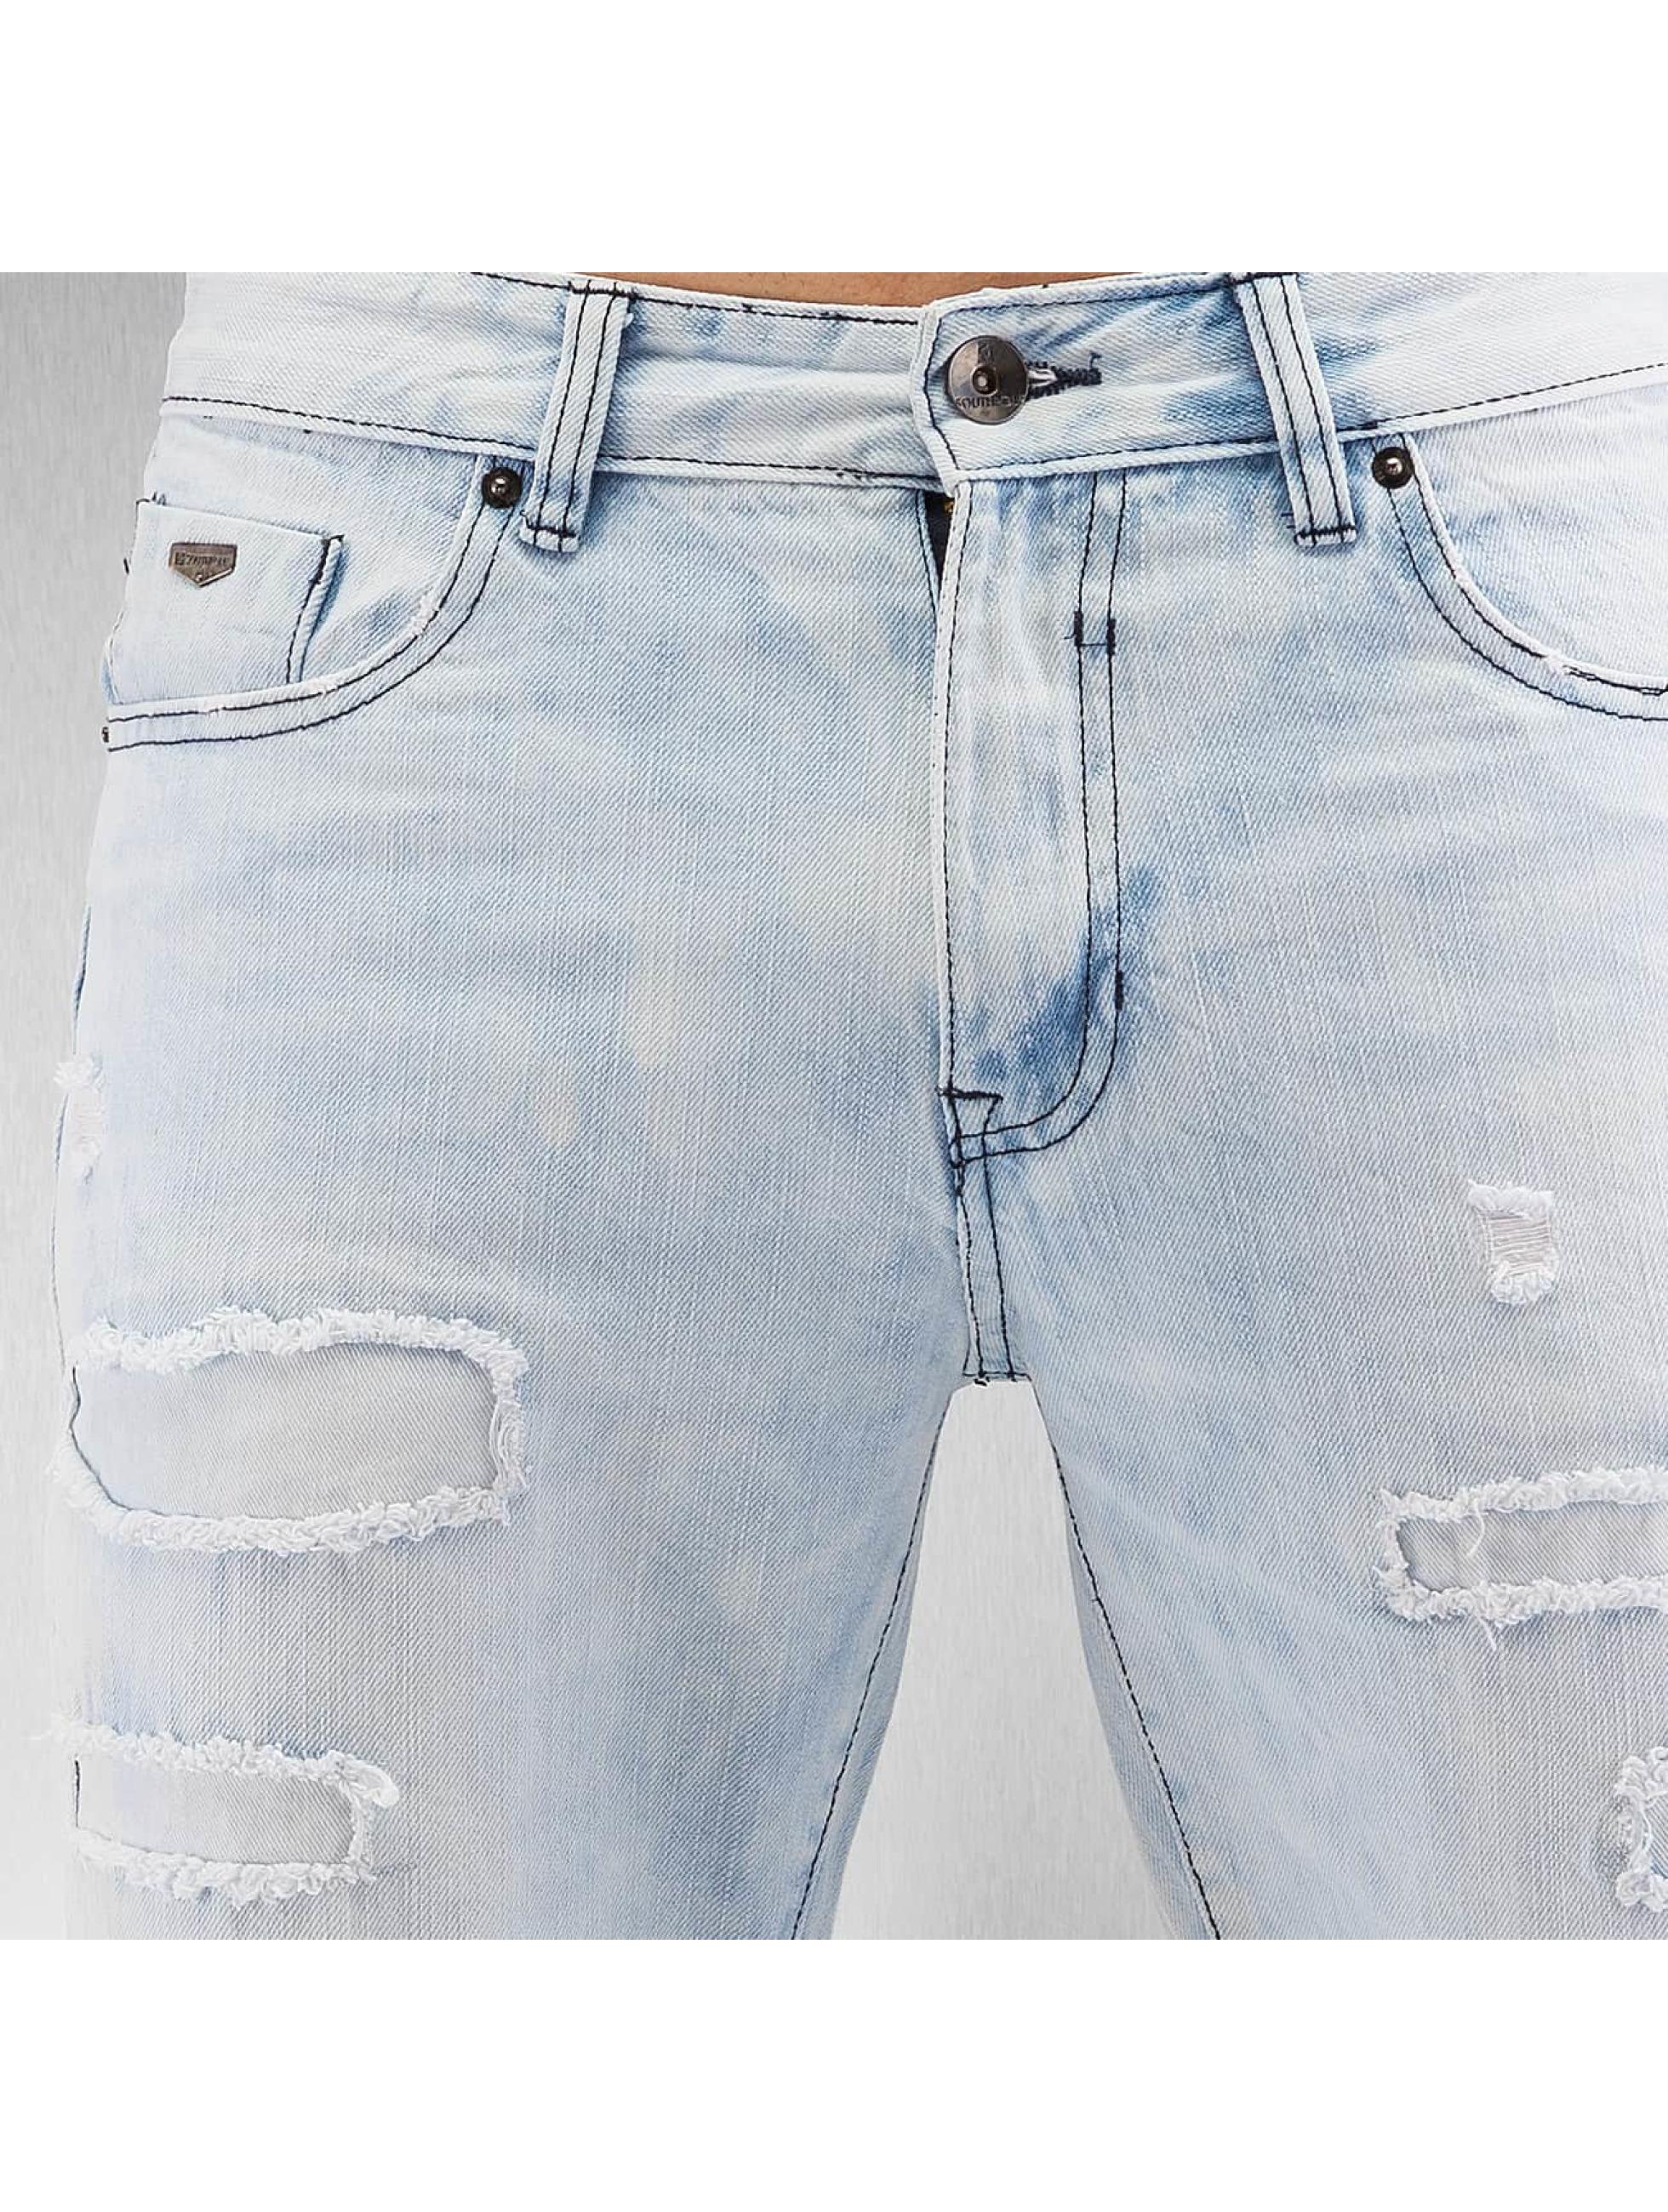 Southpole Slim Fit Kot Ripped Slim mavi